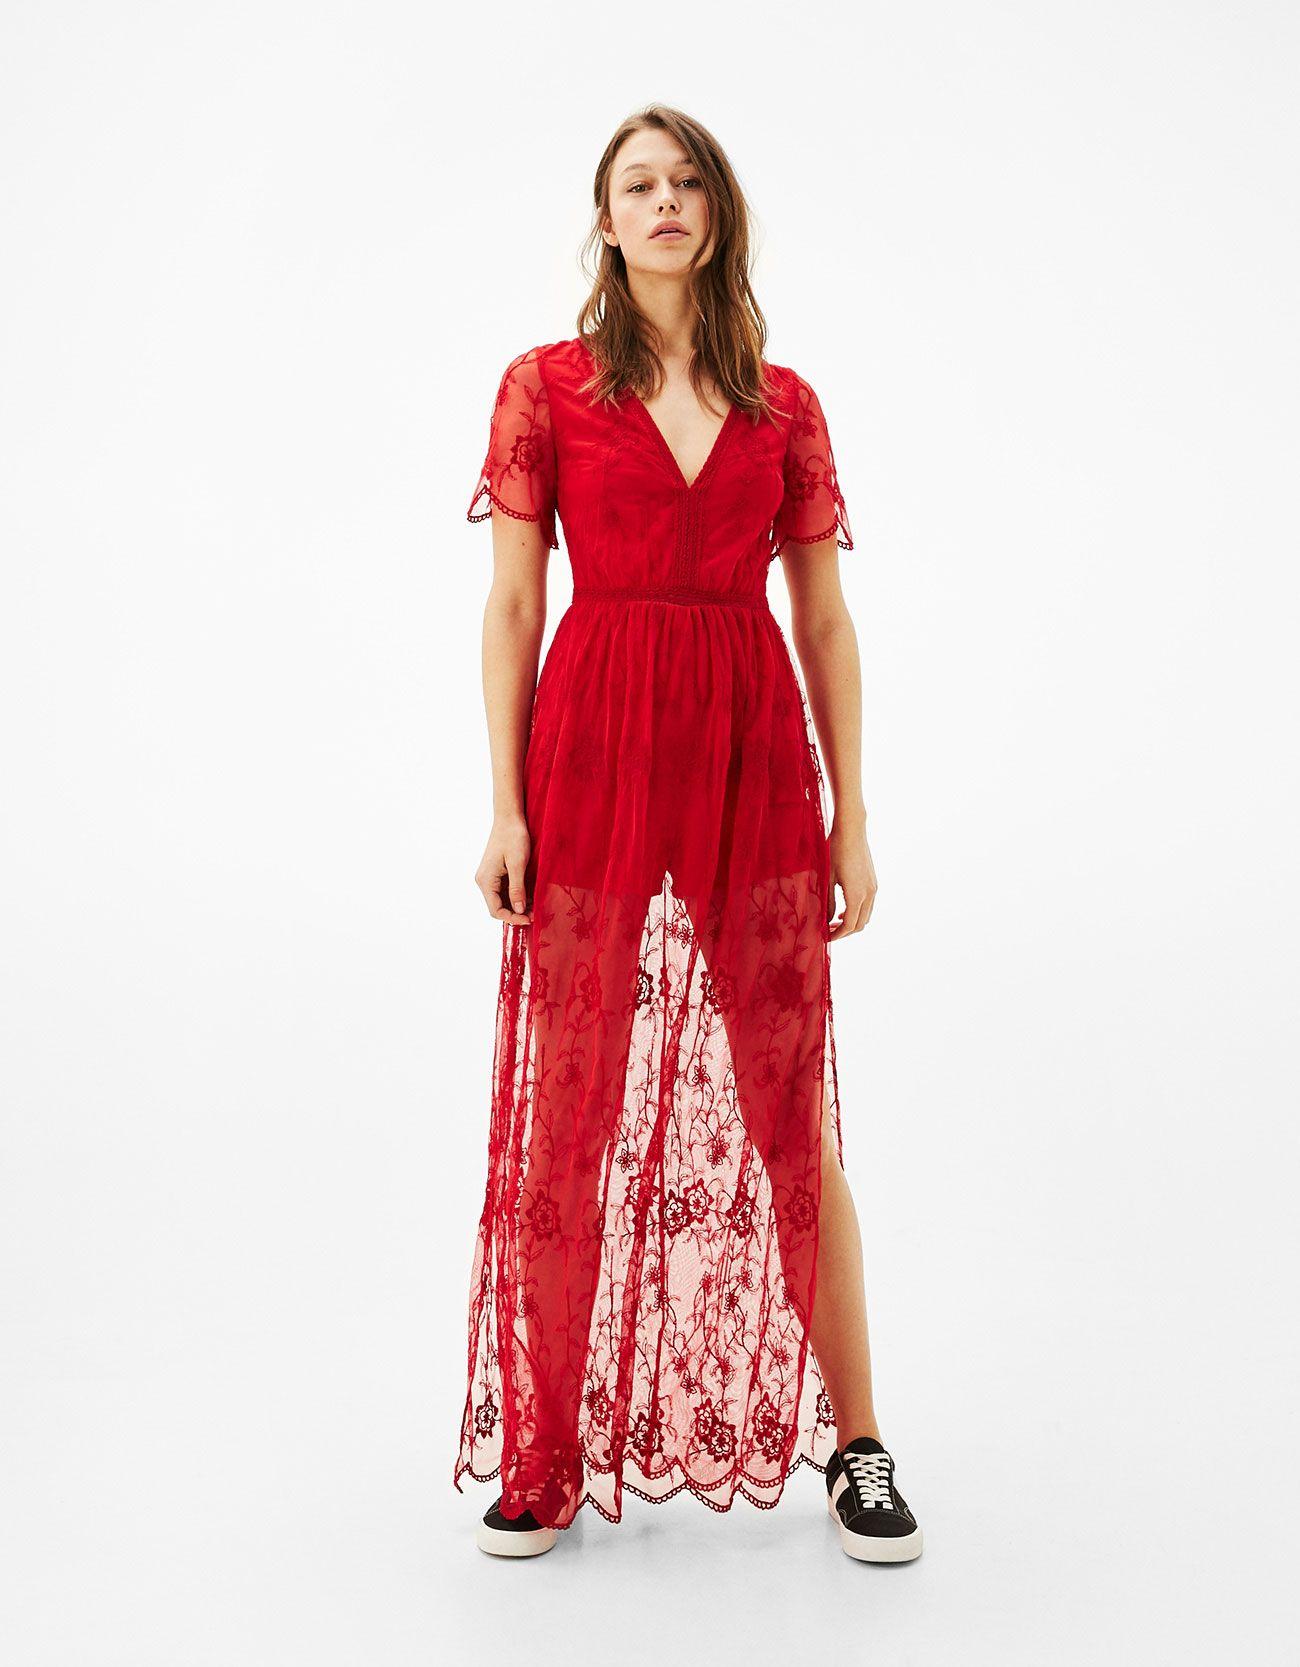 Vestido rojo flores bershka